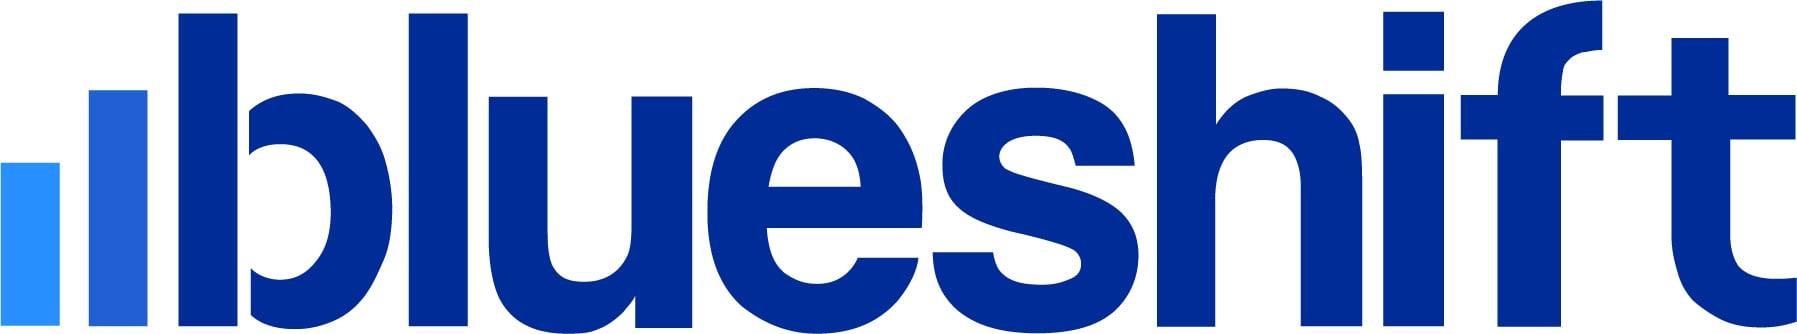 blueshift-logo-primary